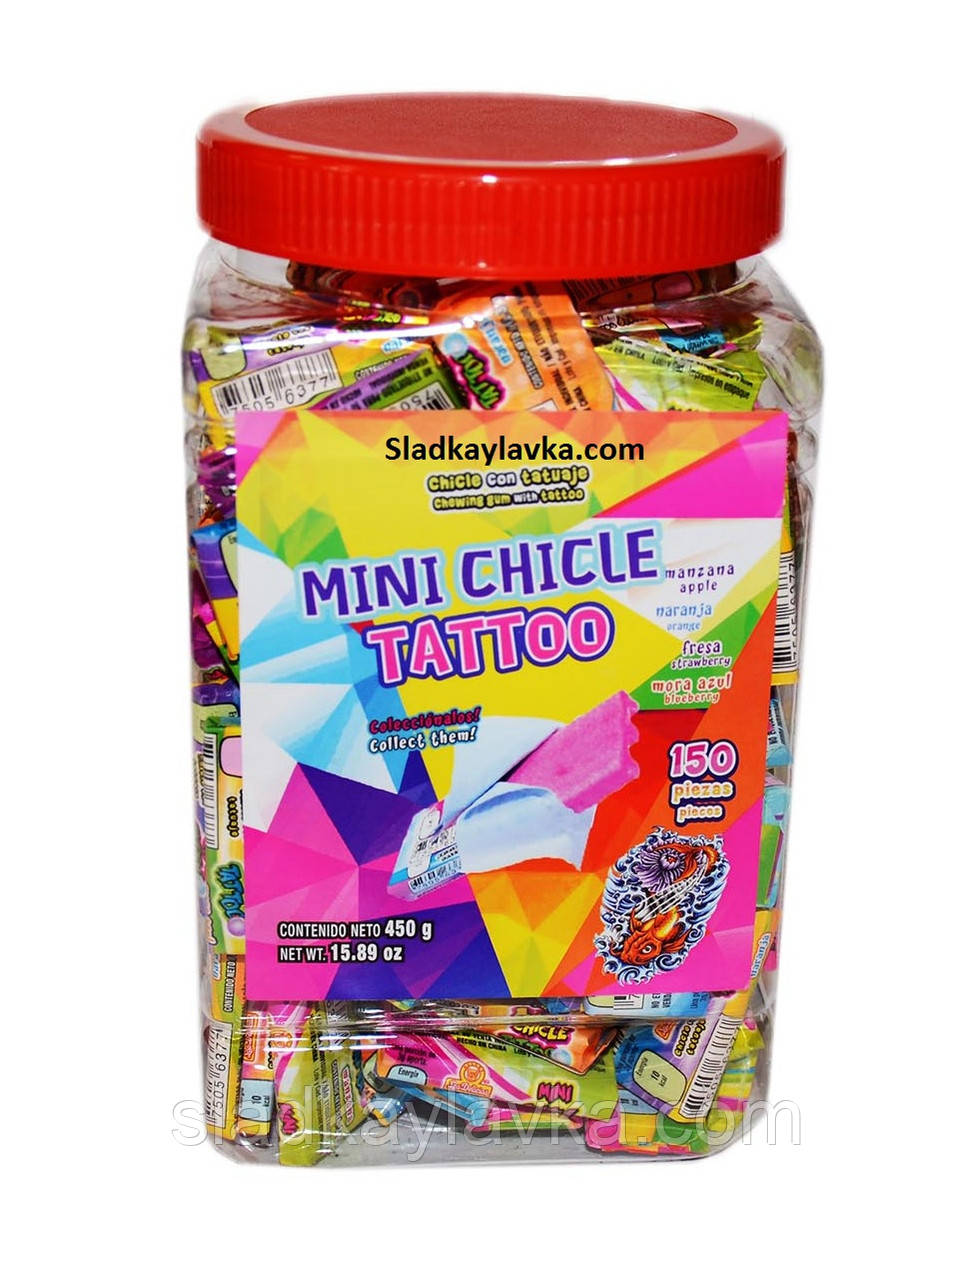 Жевательная резинка Bubble gum Mini chicle tattoo 4 см 150 шт (China)